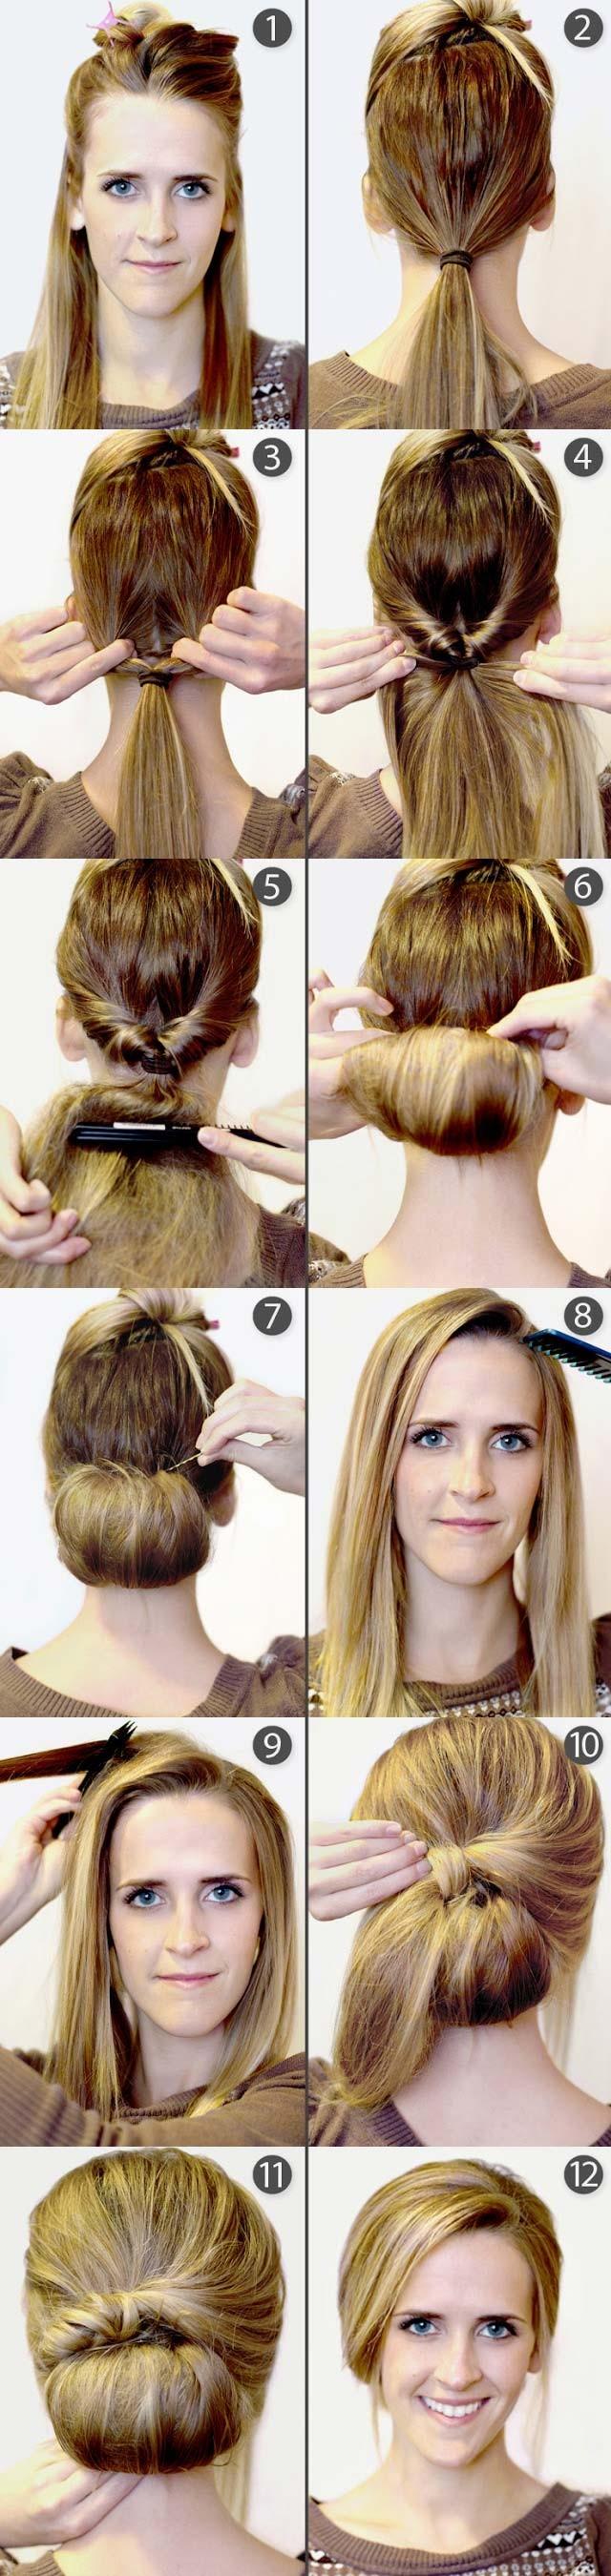 Strange 15 Cute Hairstyles Step By Step Hairstyles For Long Hair Short Hairstyles Gunalazisus